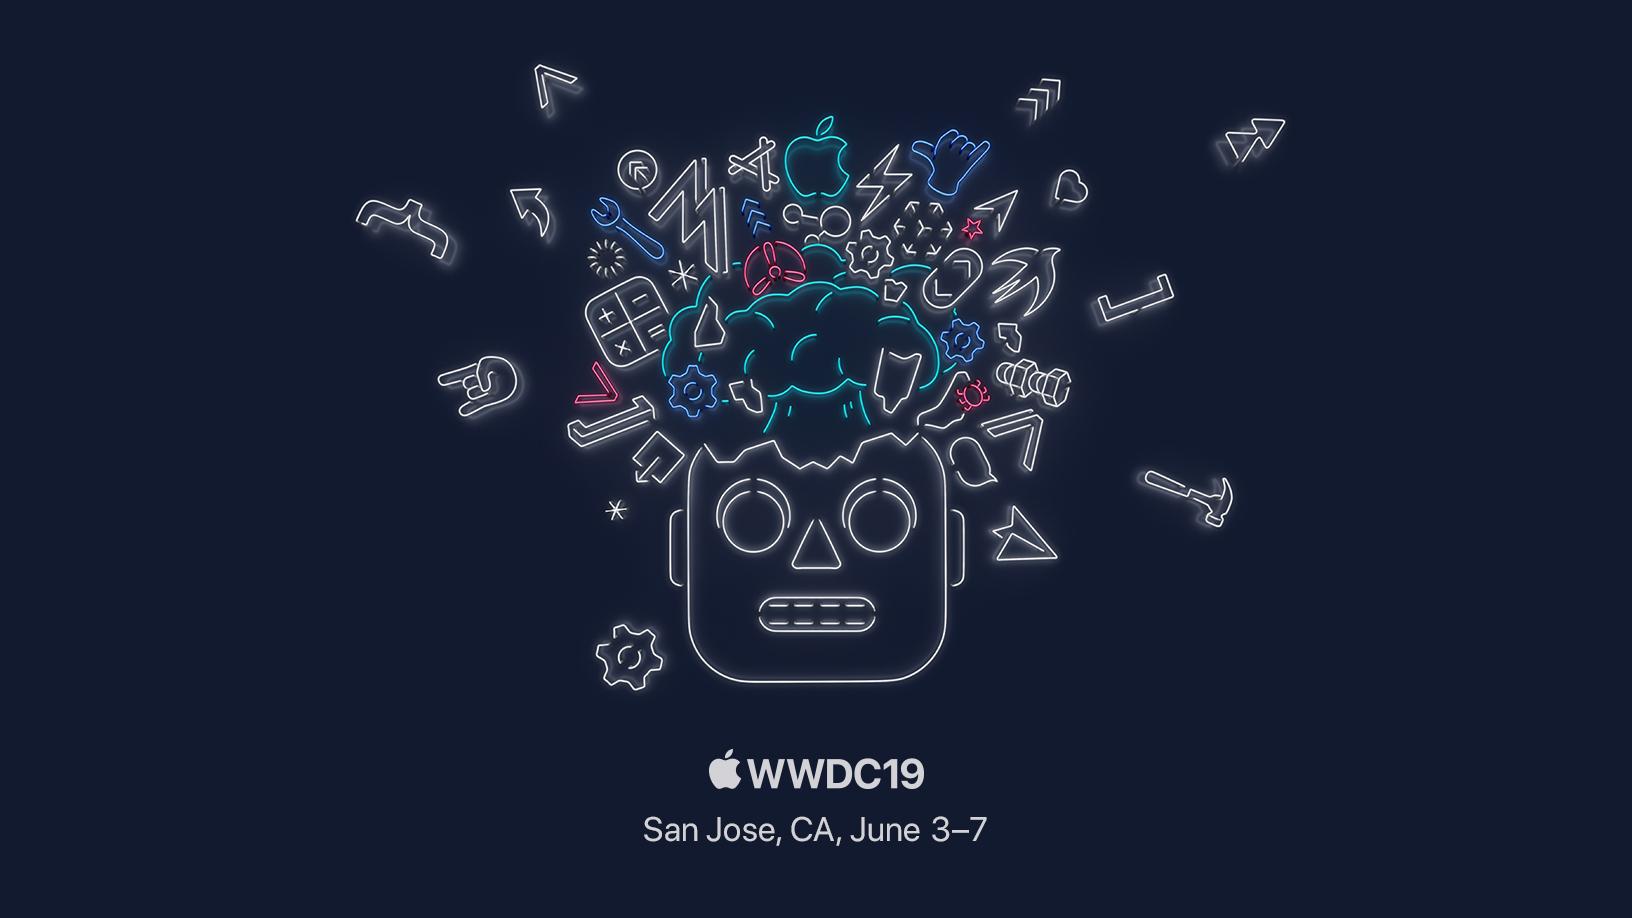 Cartel de la WWDC 2019